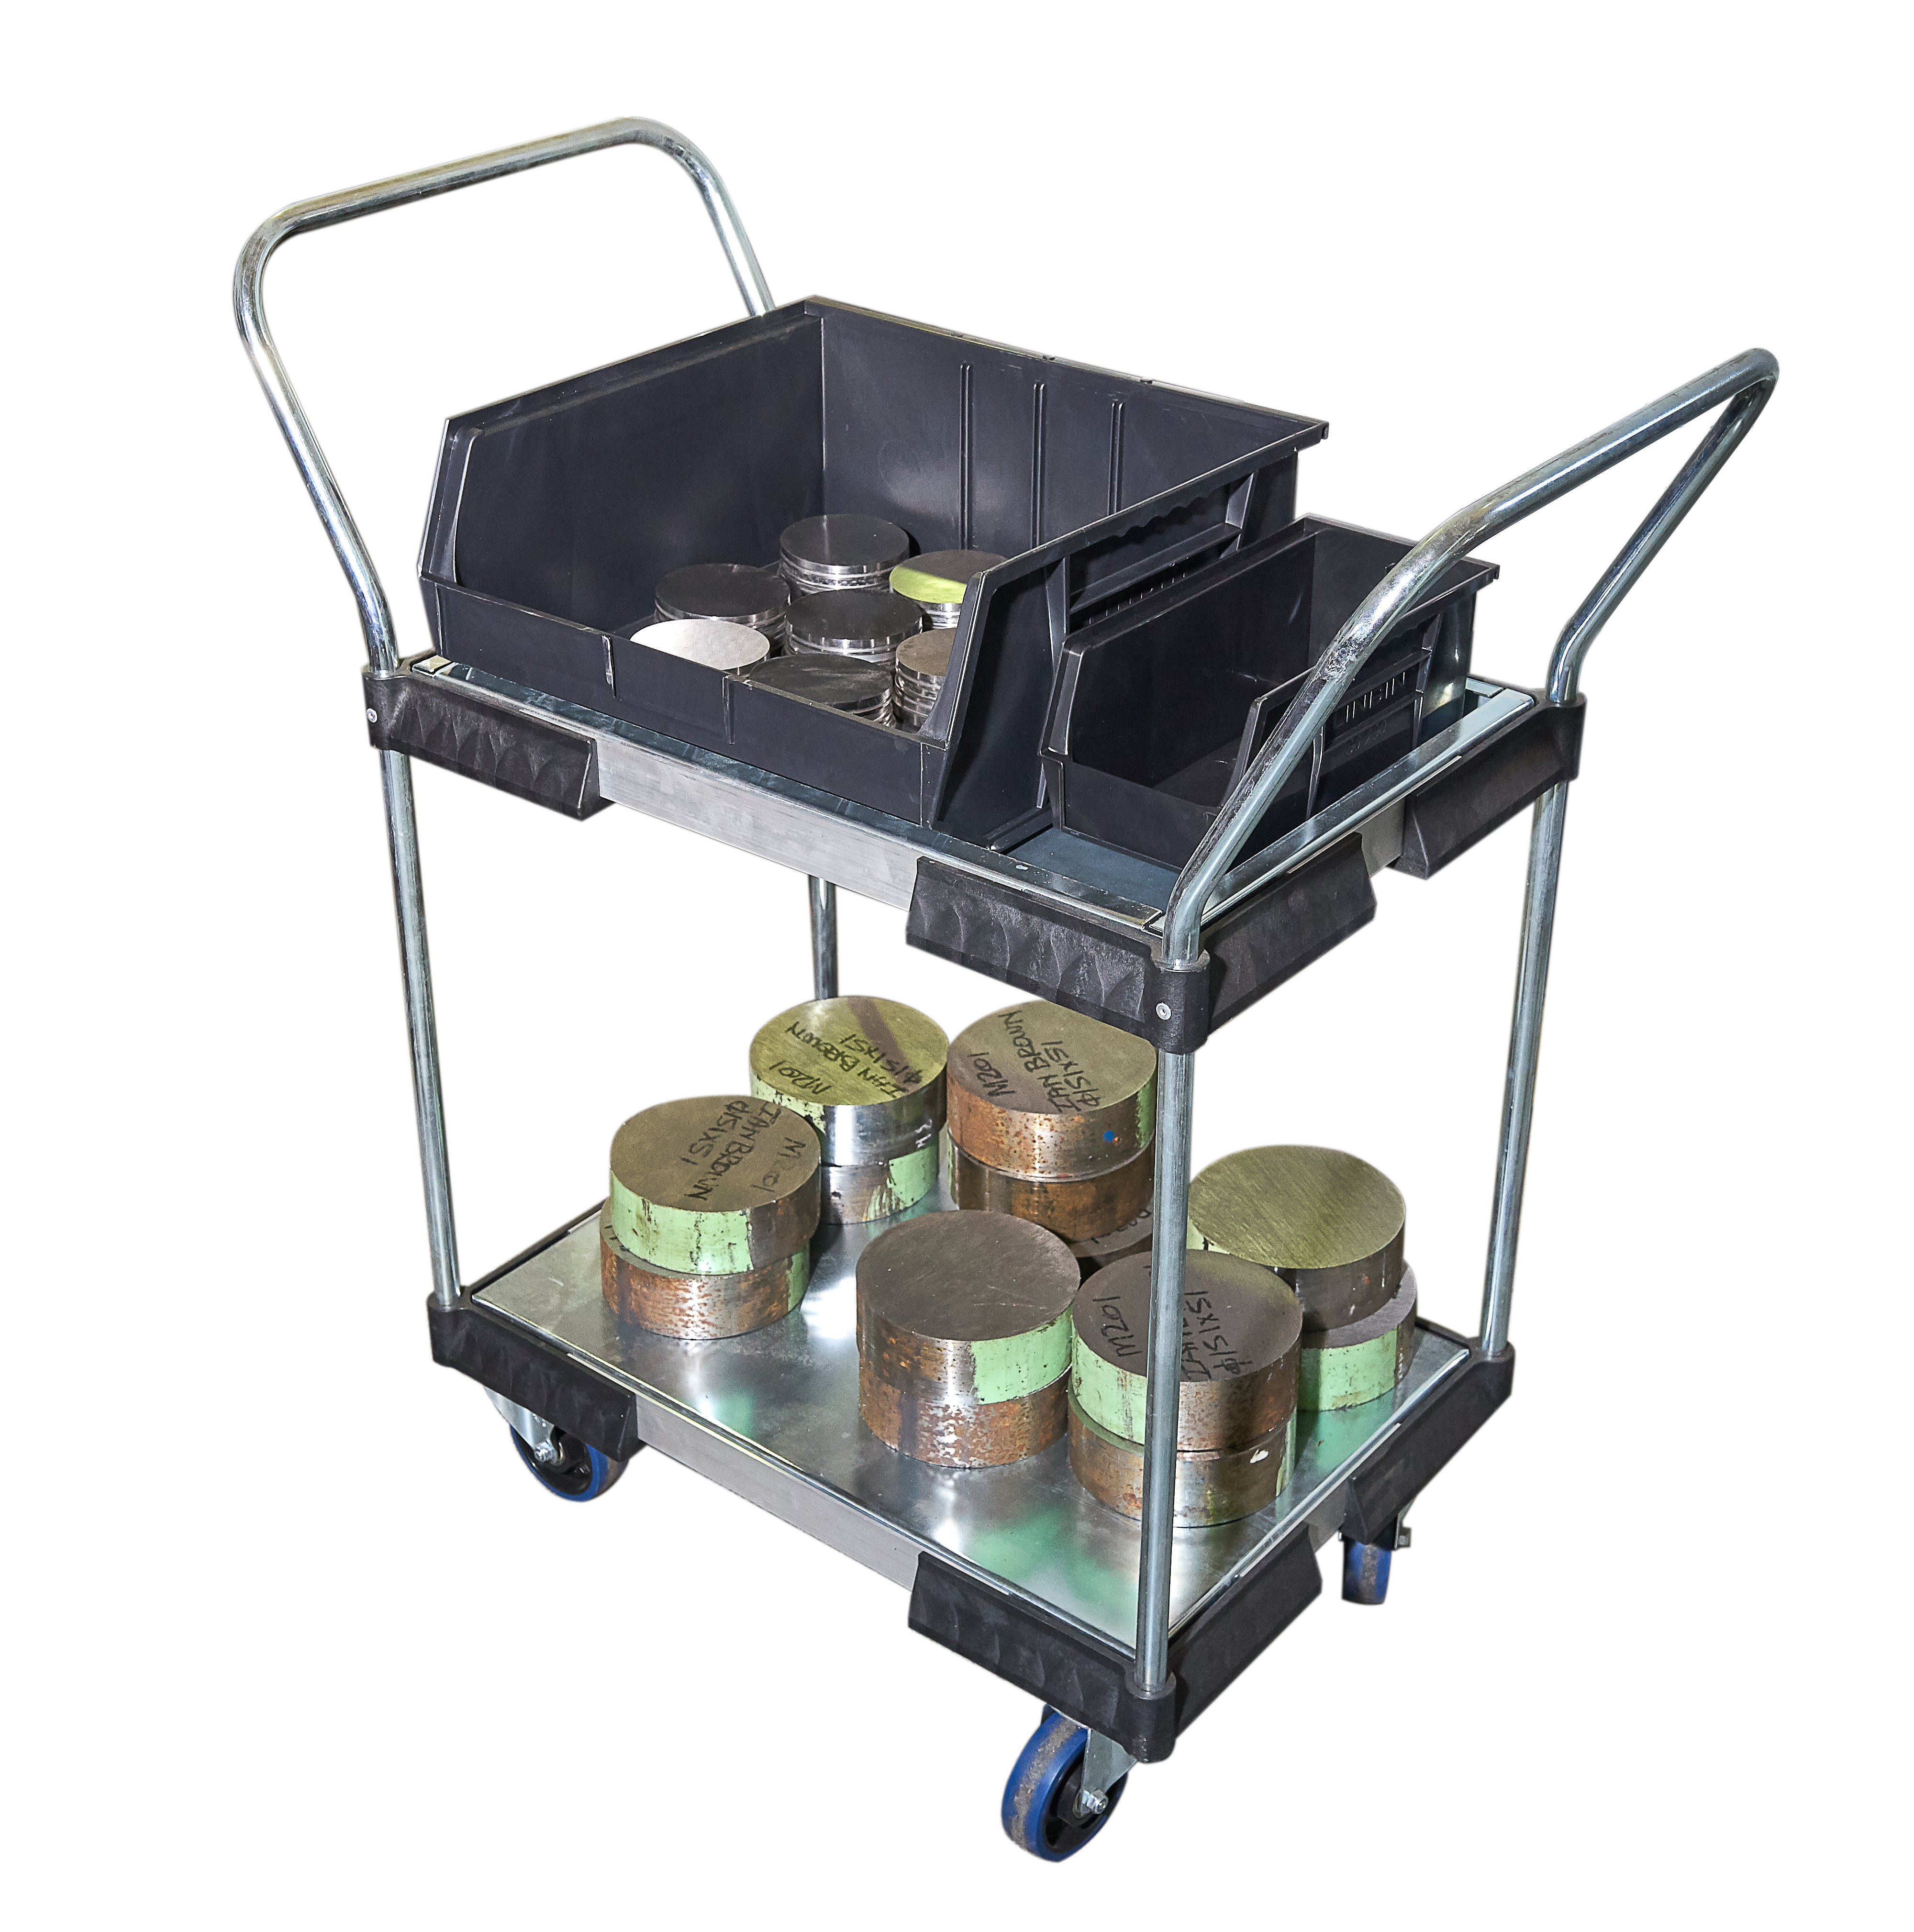 MDS Shelf Trolley